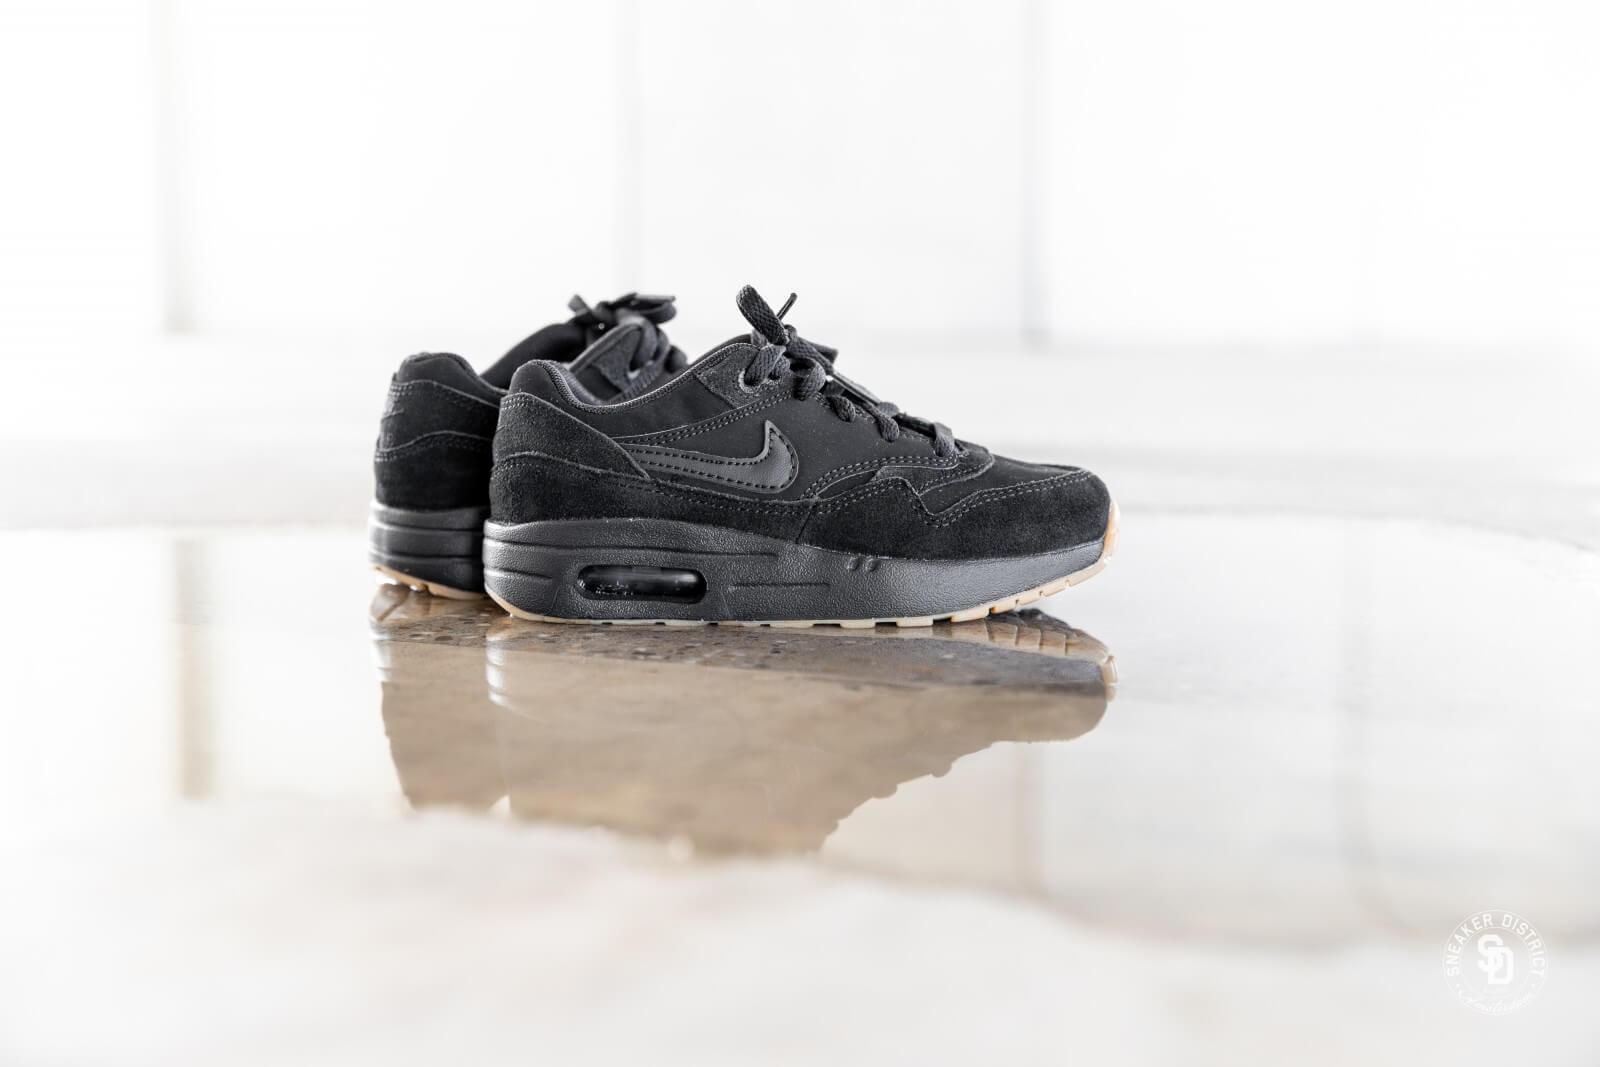 807603 008 Nike Air Max 1 Black//Black-Black TD